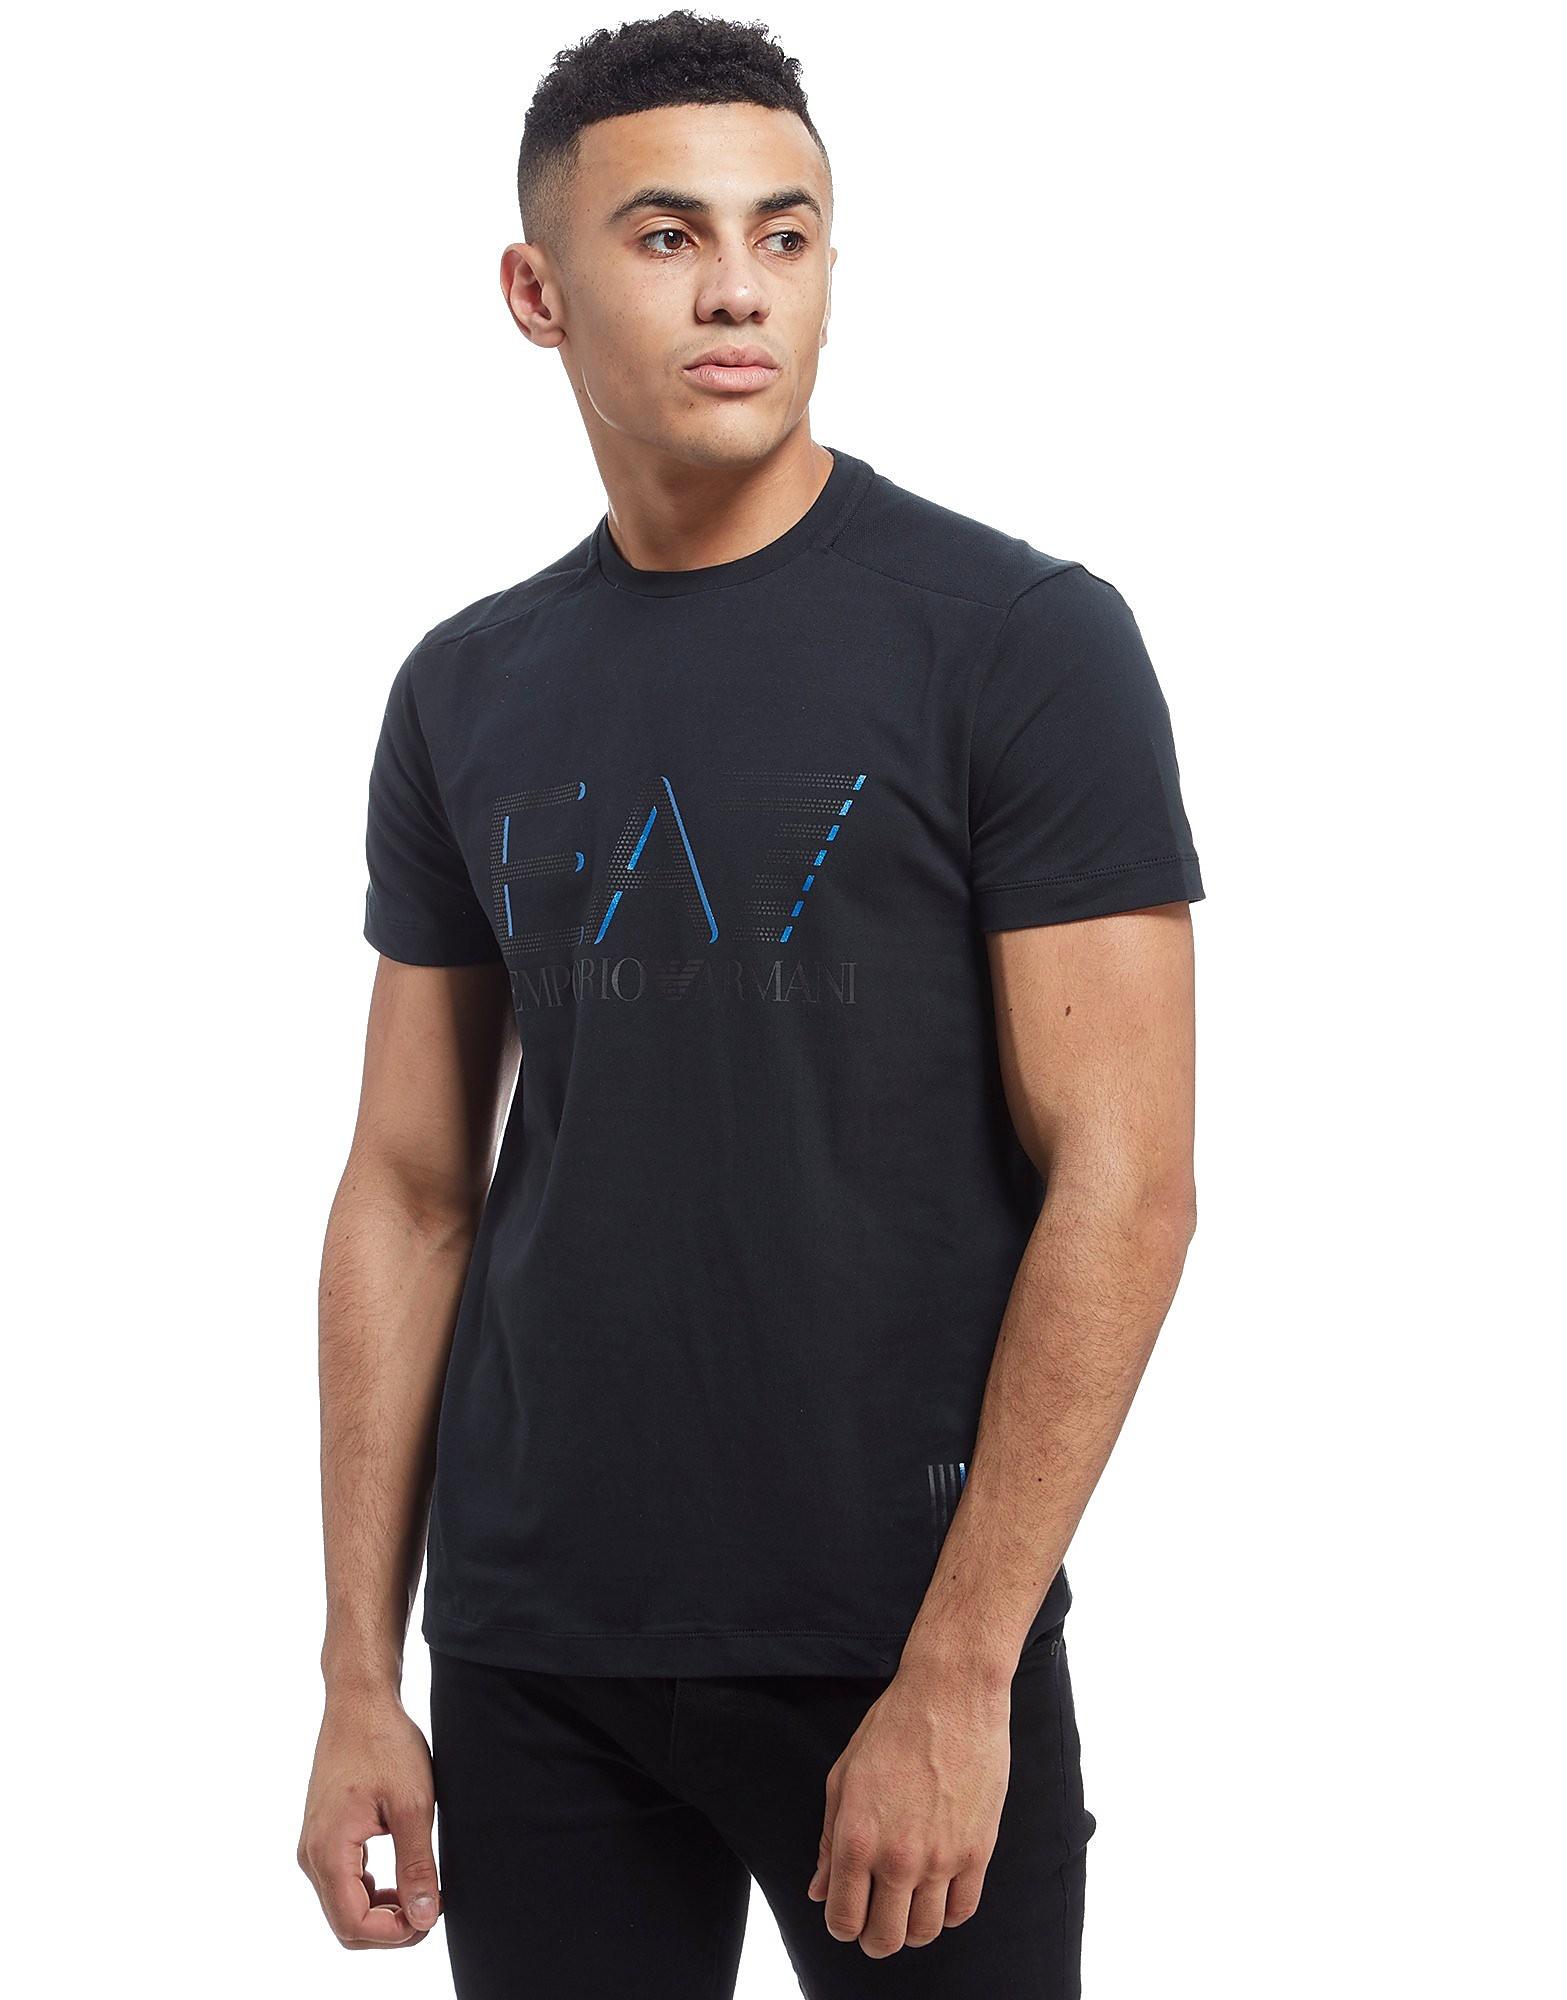 Emporio Armani EA7 Evolution T-Shirt